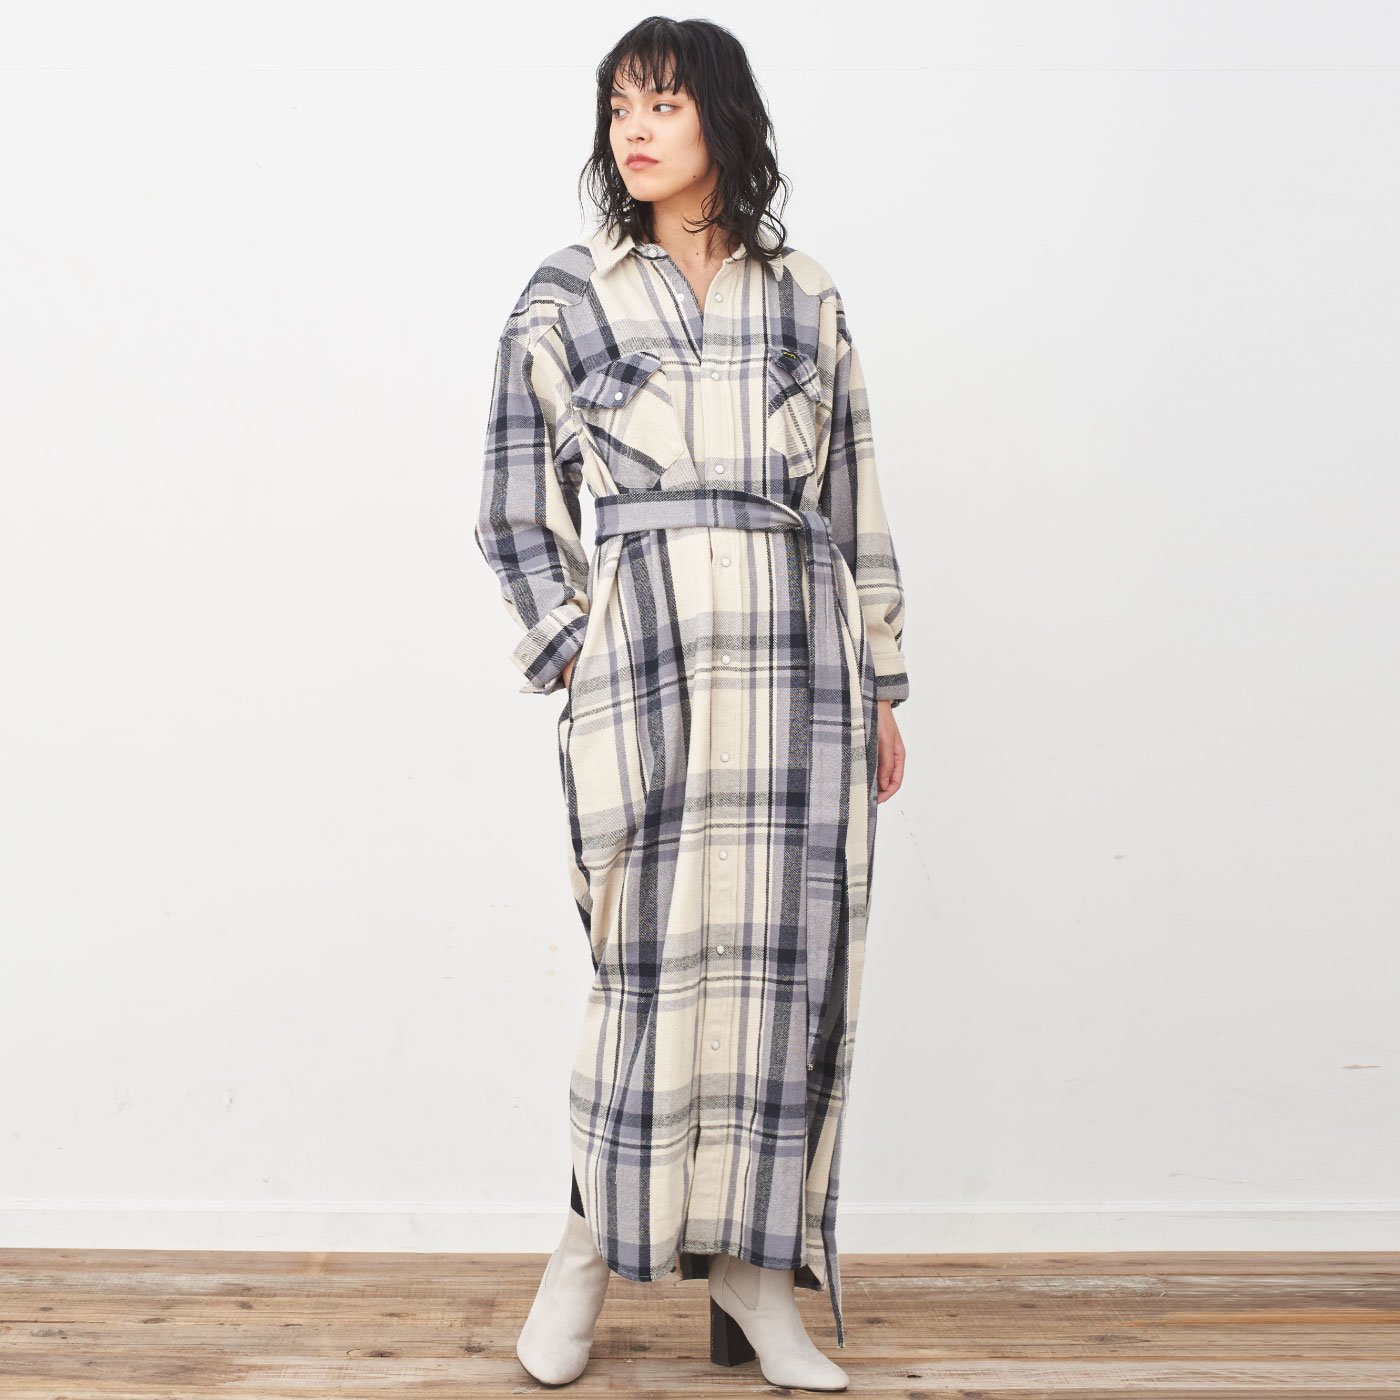 MEDE19F 〈SELECT〉 Wrangler SHIRT DRESS〈BLK〉